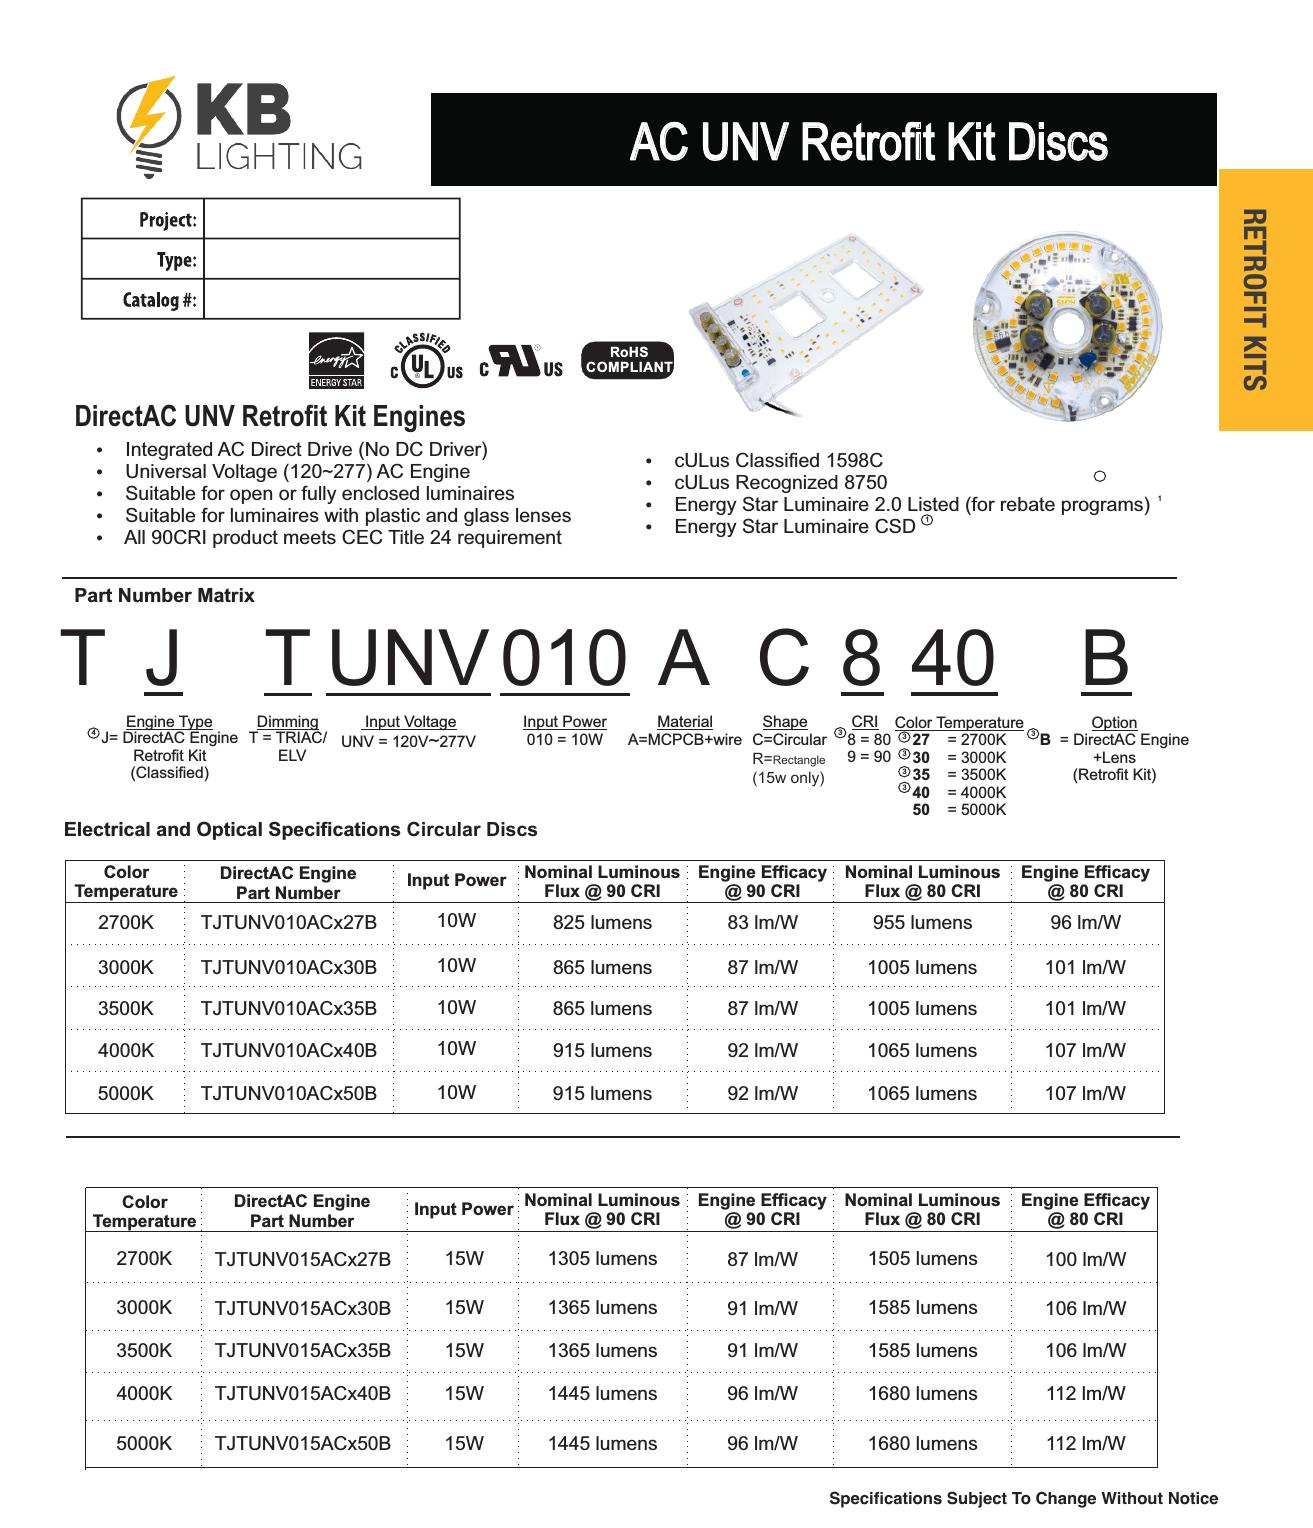 AC UNV Retrofit Kit Discs | KB Lighting